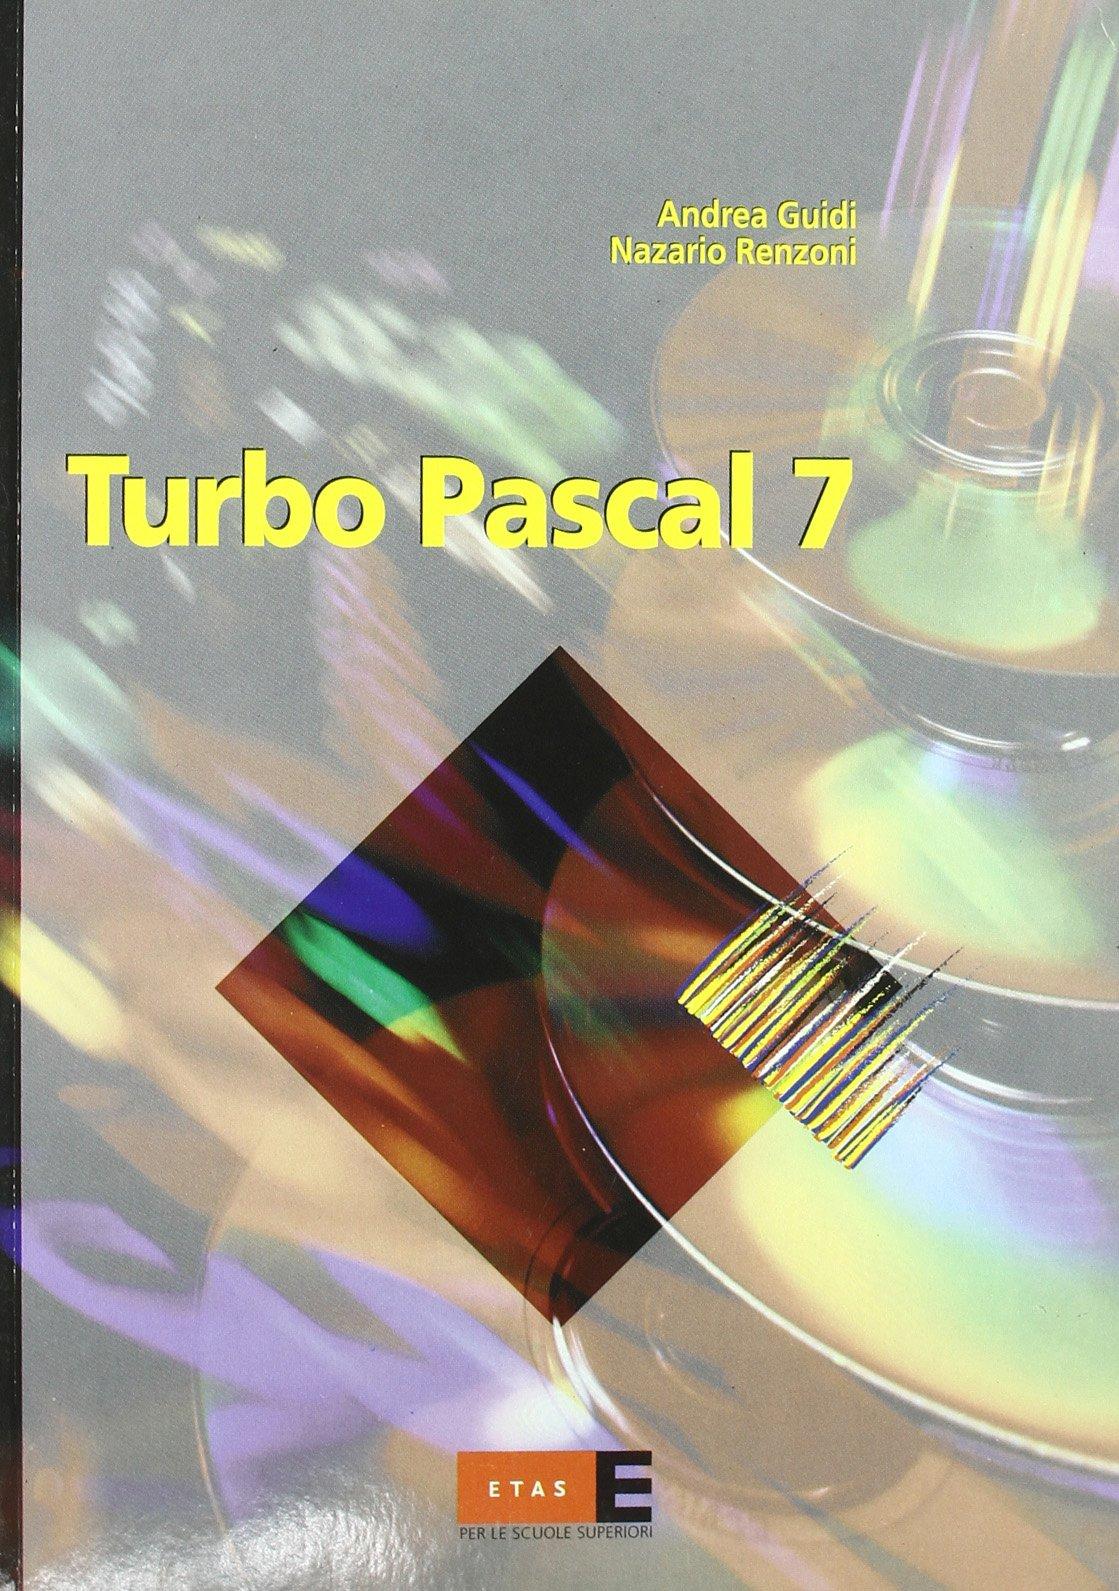 Turbo Pascal 7 (Per la scuola secondaria superiore): Amazon.es: Andrea Guidi, Nazario Renzoni: Libros en idiomas extranjeros